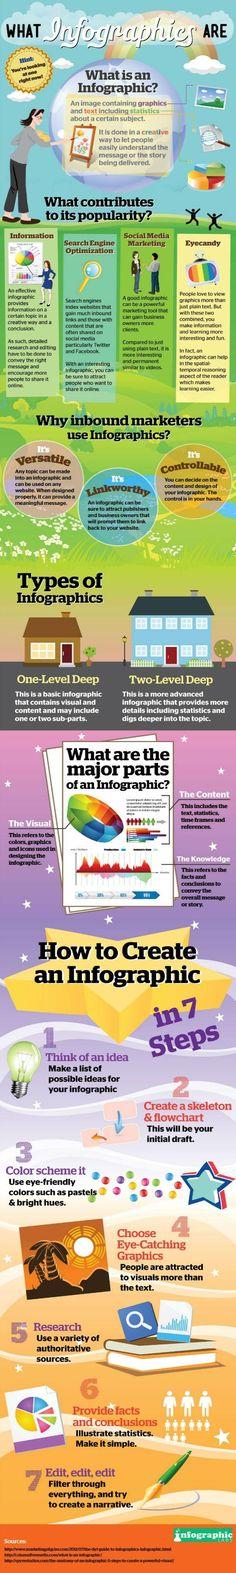 Inforgrafika o... infografikach// Infographic about... infographics :)